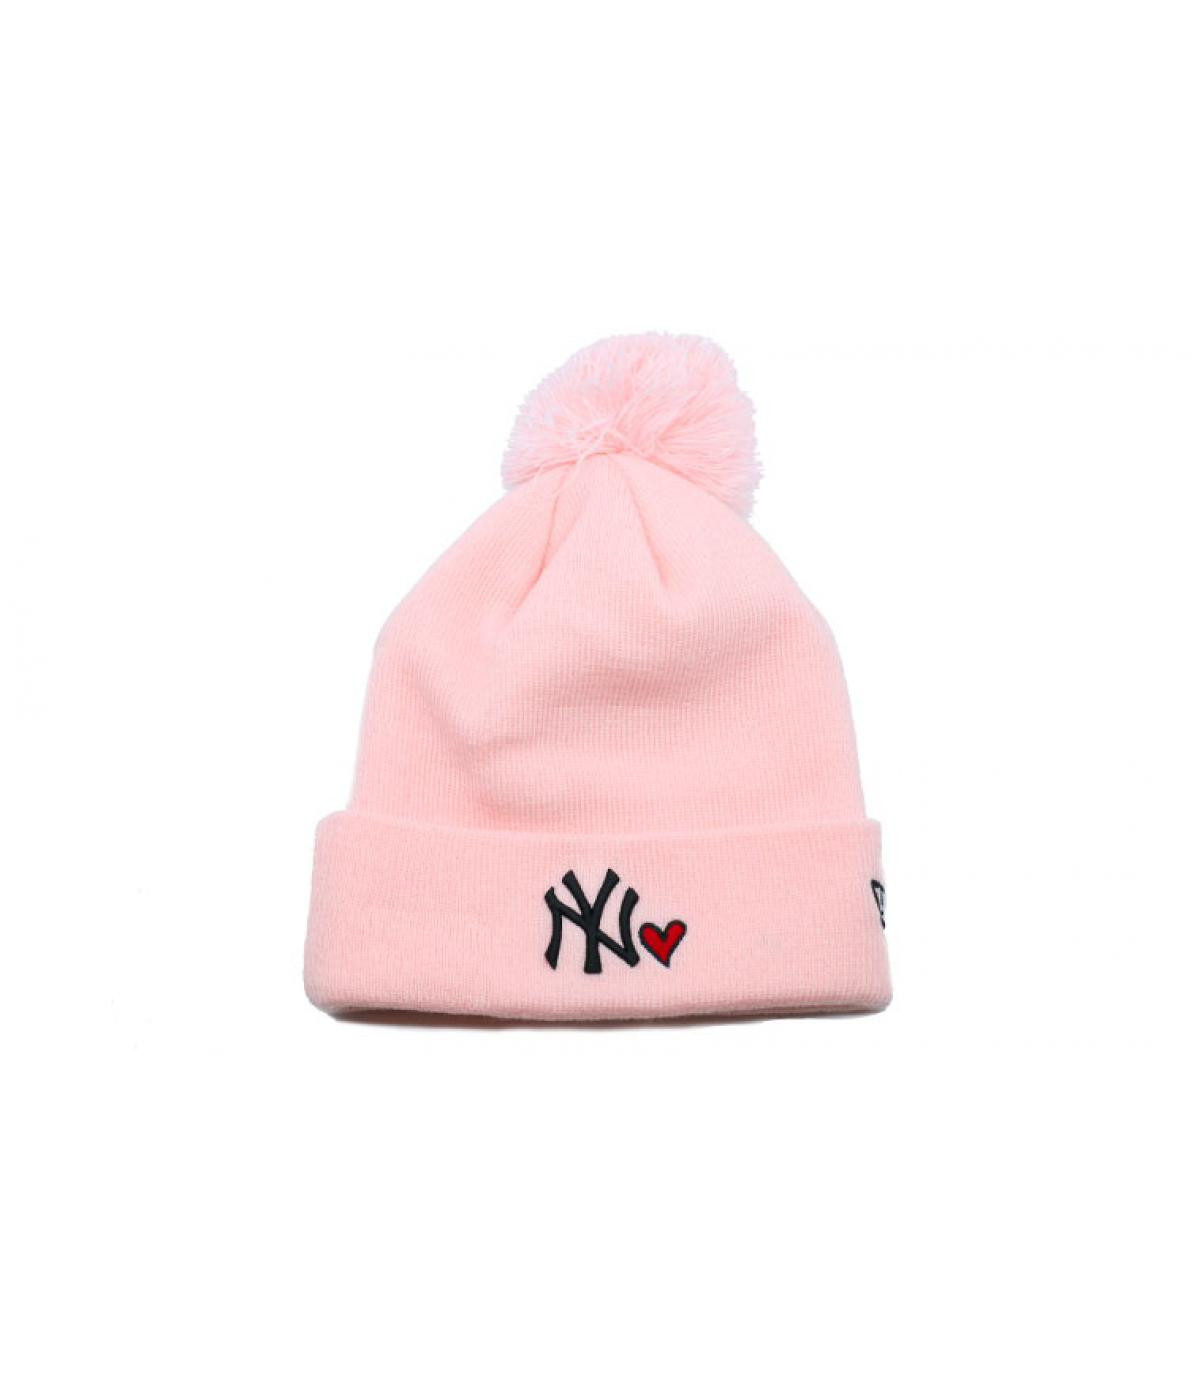 Details Bonnet Wmns Heart NY knit pink - afbeeling 2